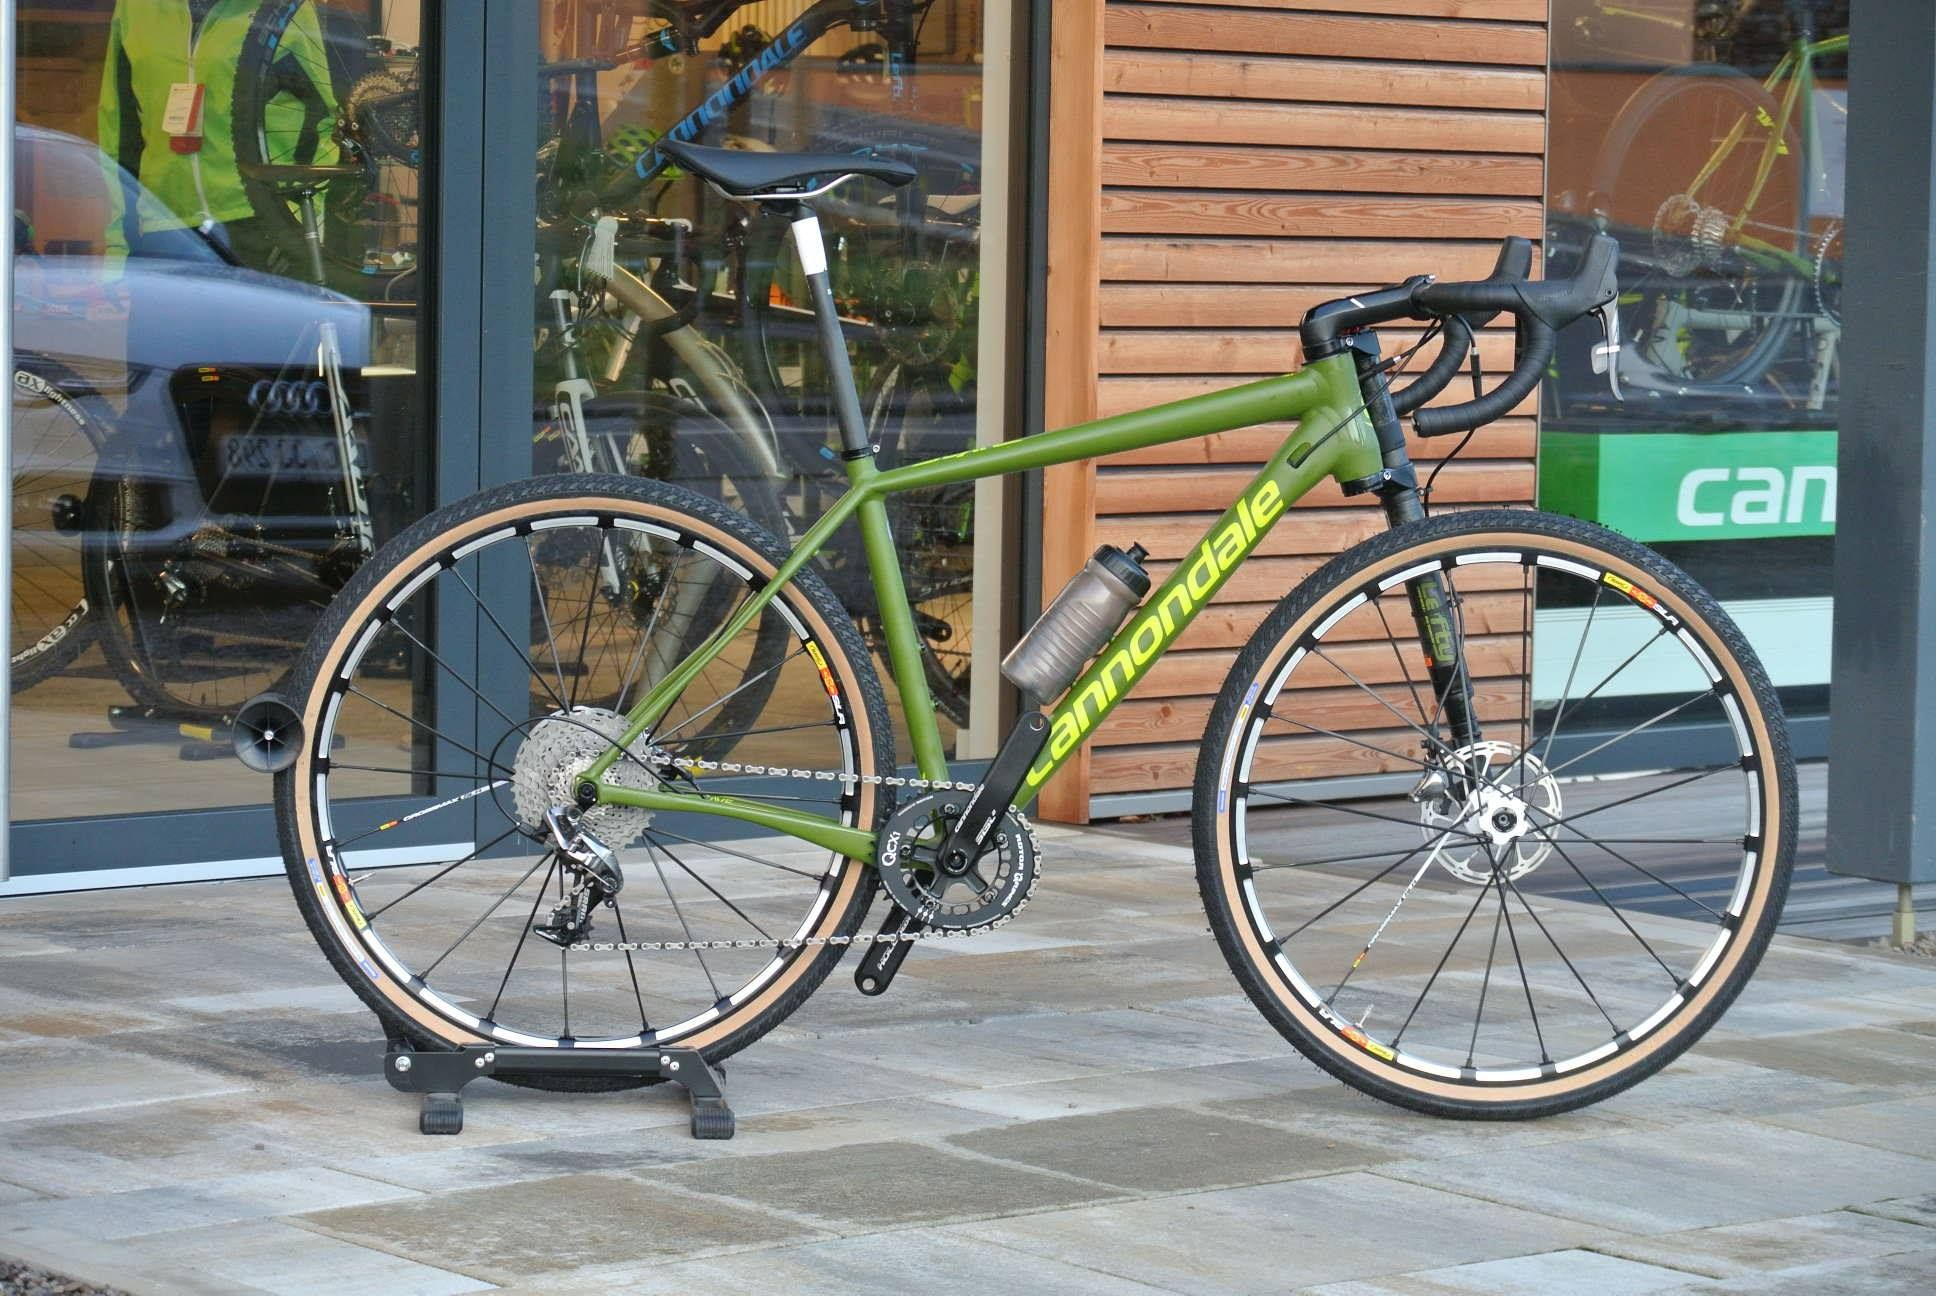 Comprar bicicletas Aranda de Duero